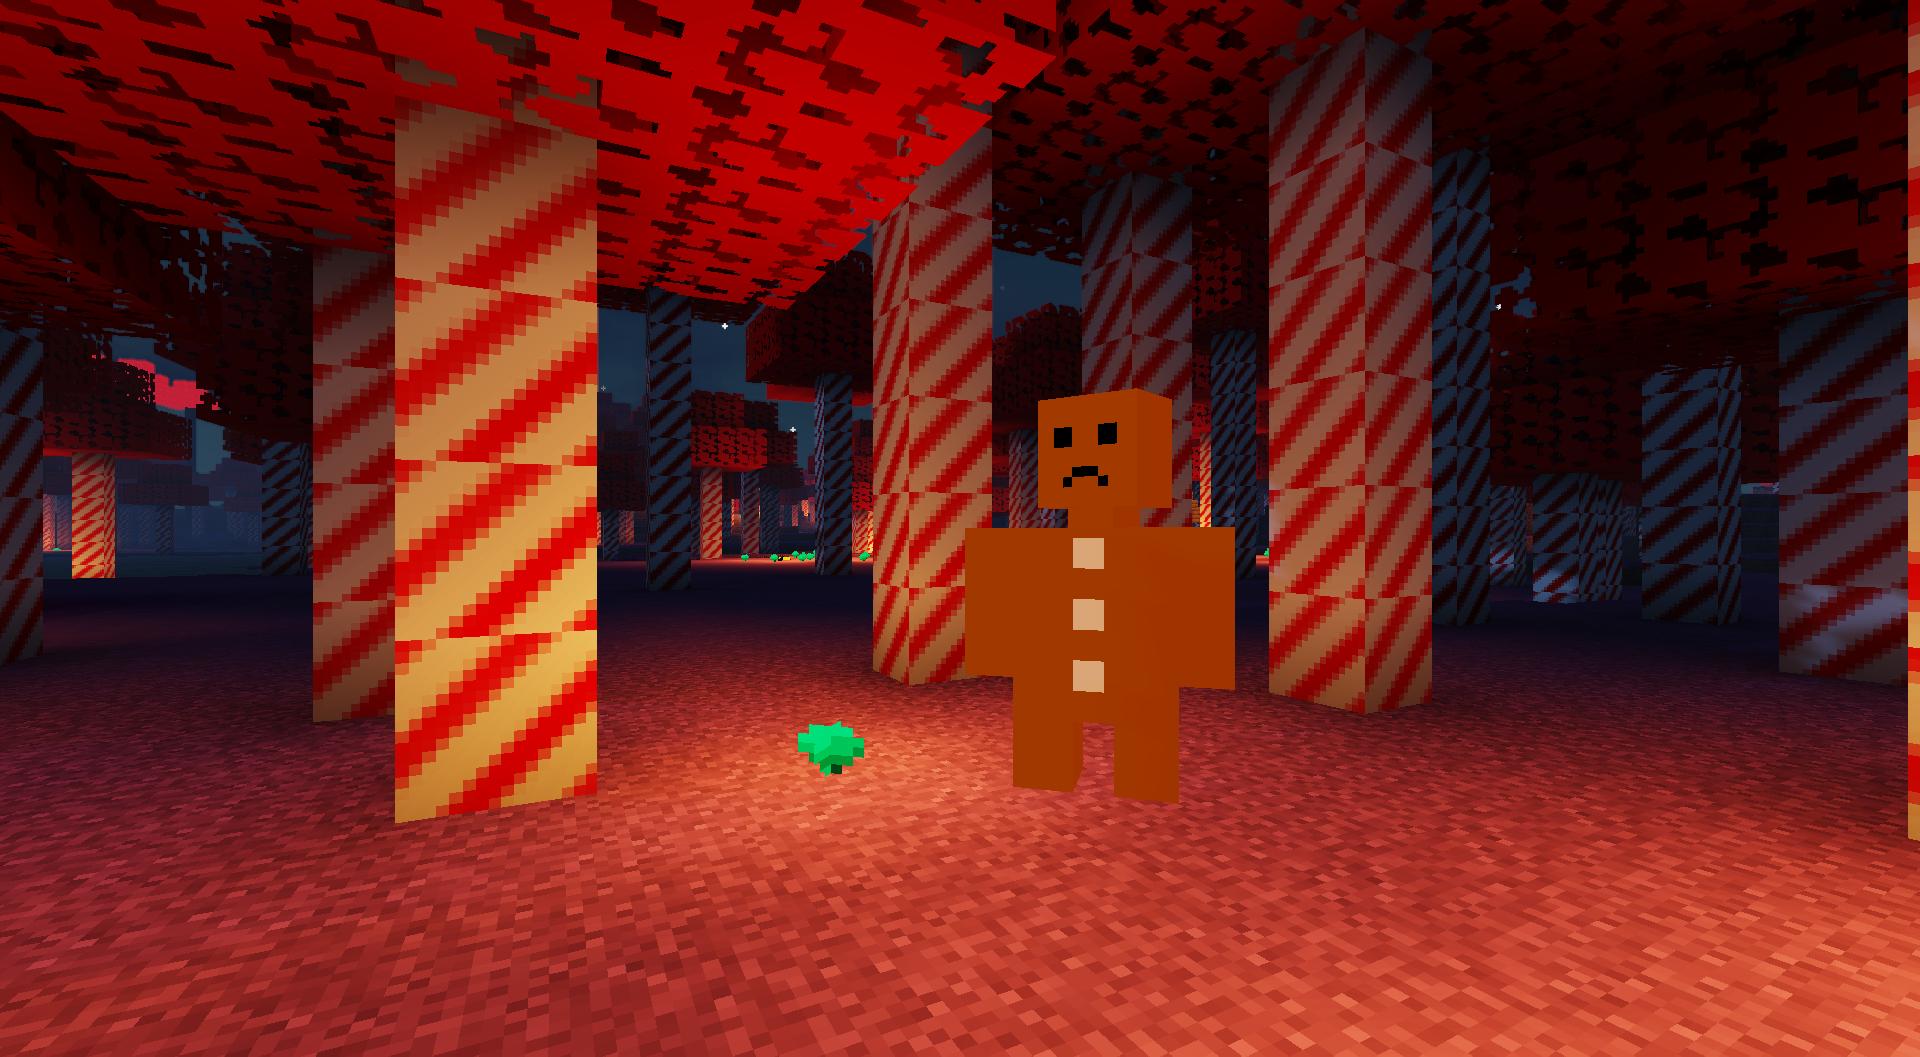 The Gingerbread Man Boss